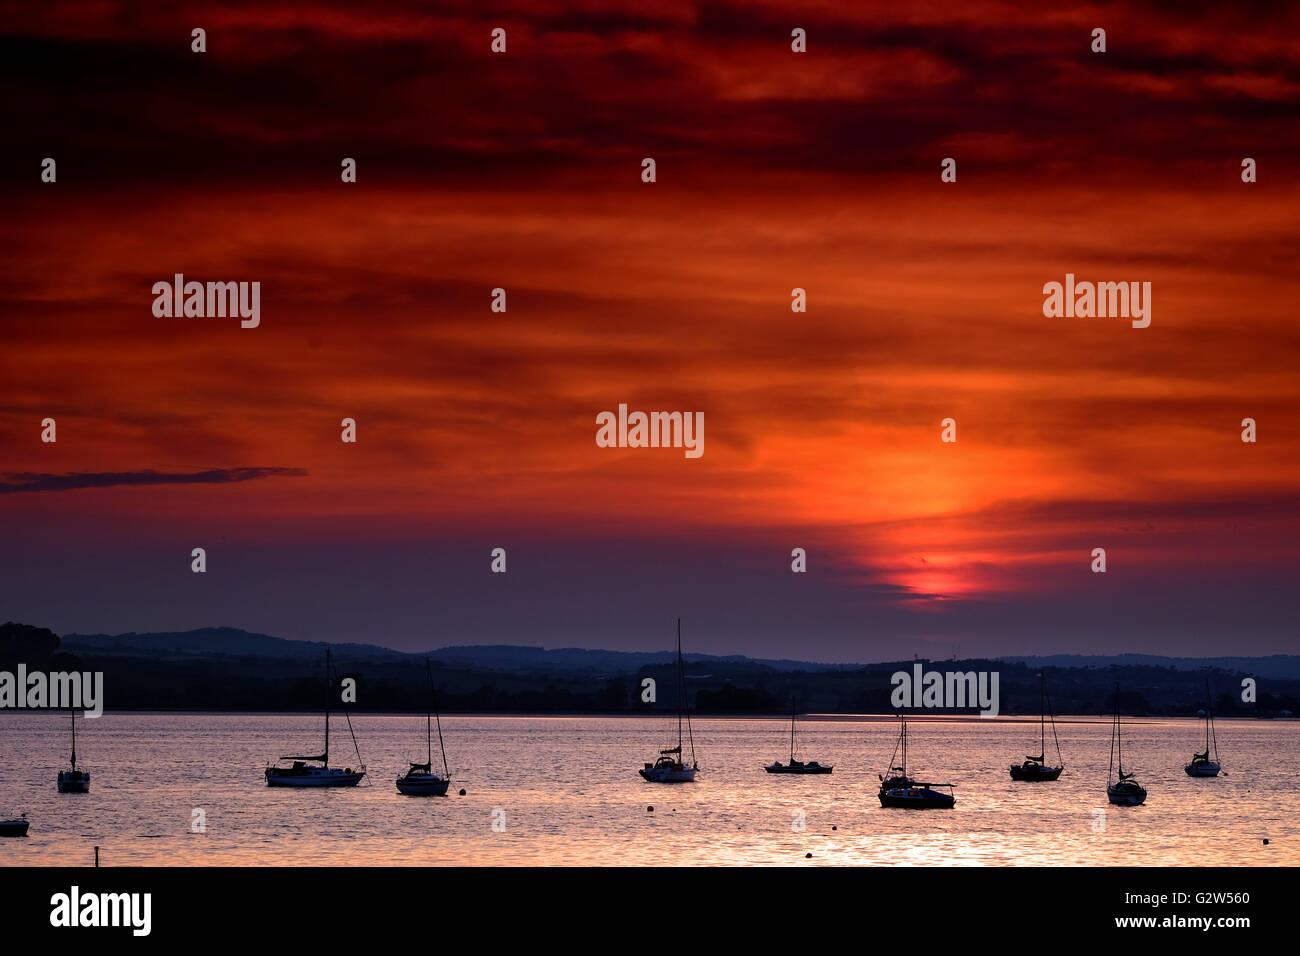 Sunset over the Exe Estuary from Lympstone, Devon, UK - Stock Image